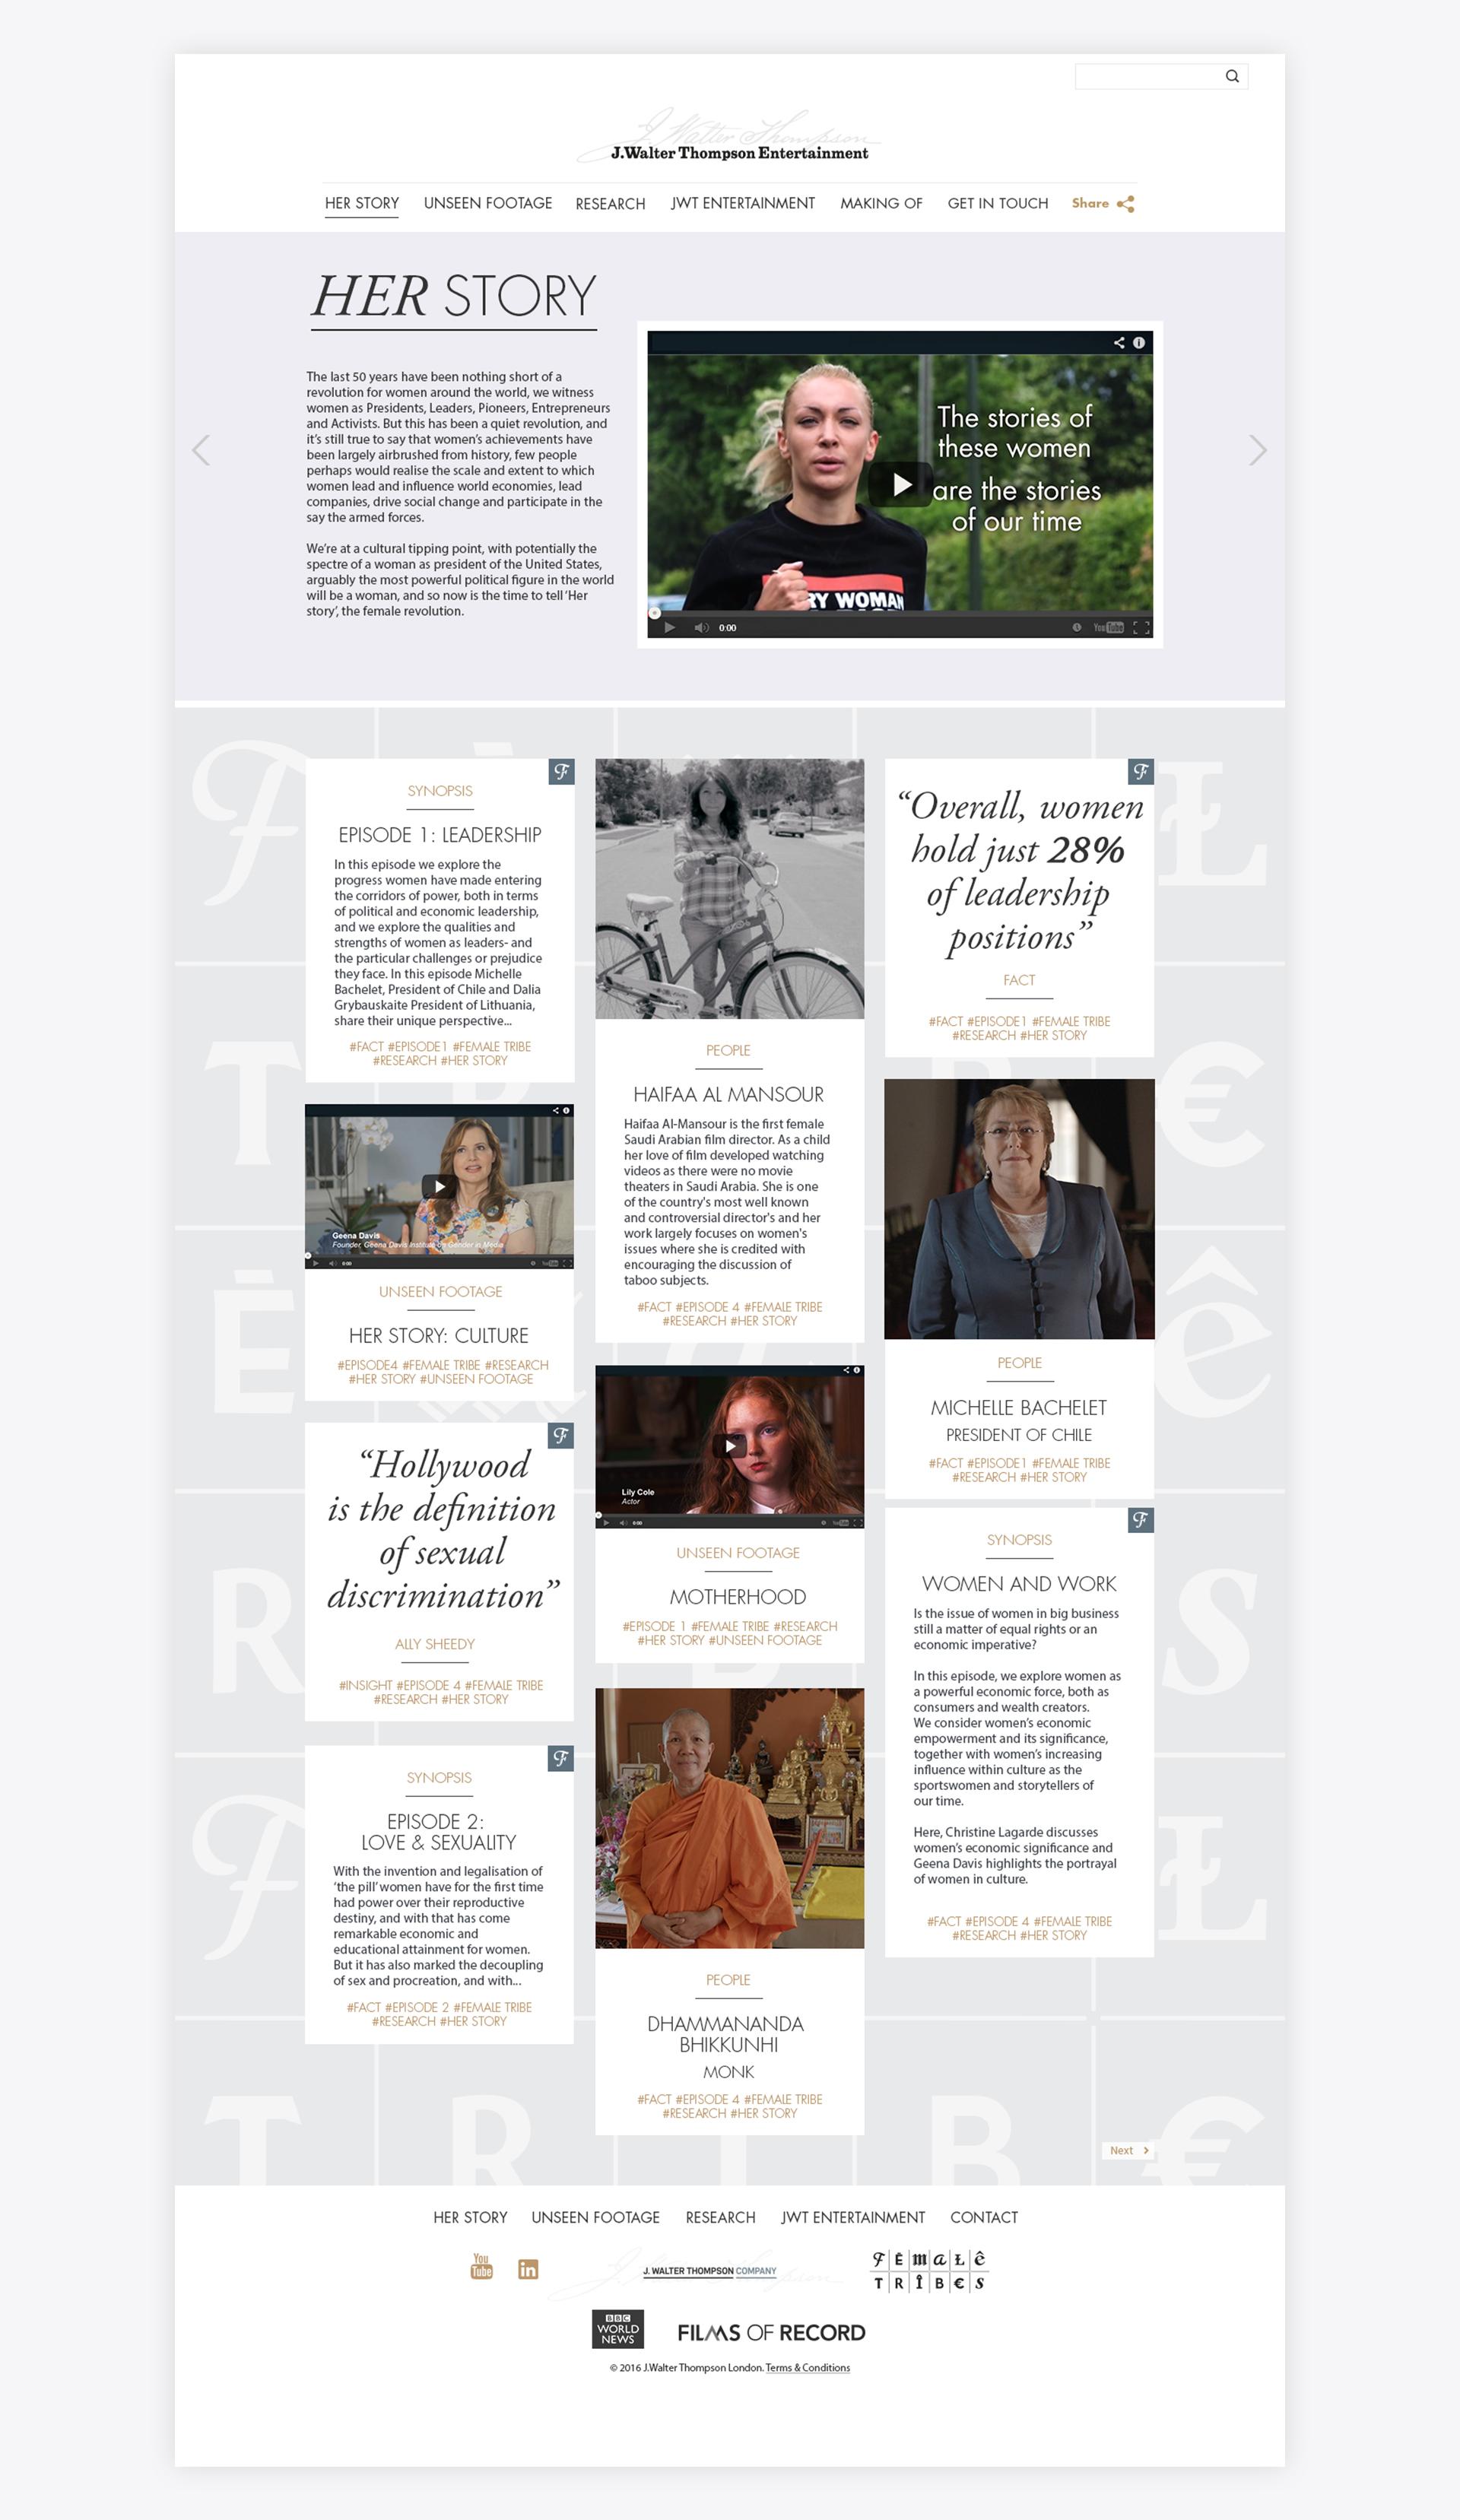 JWt_Entertainment_Homepage_full.jpg